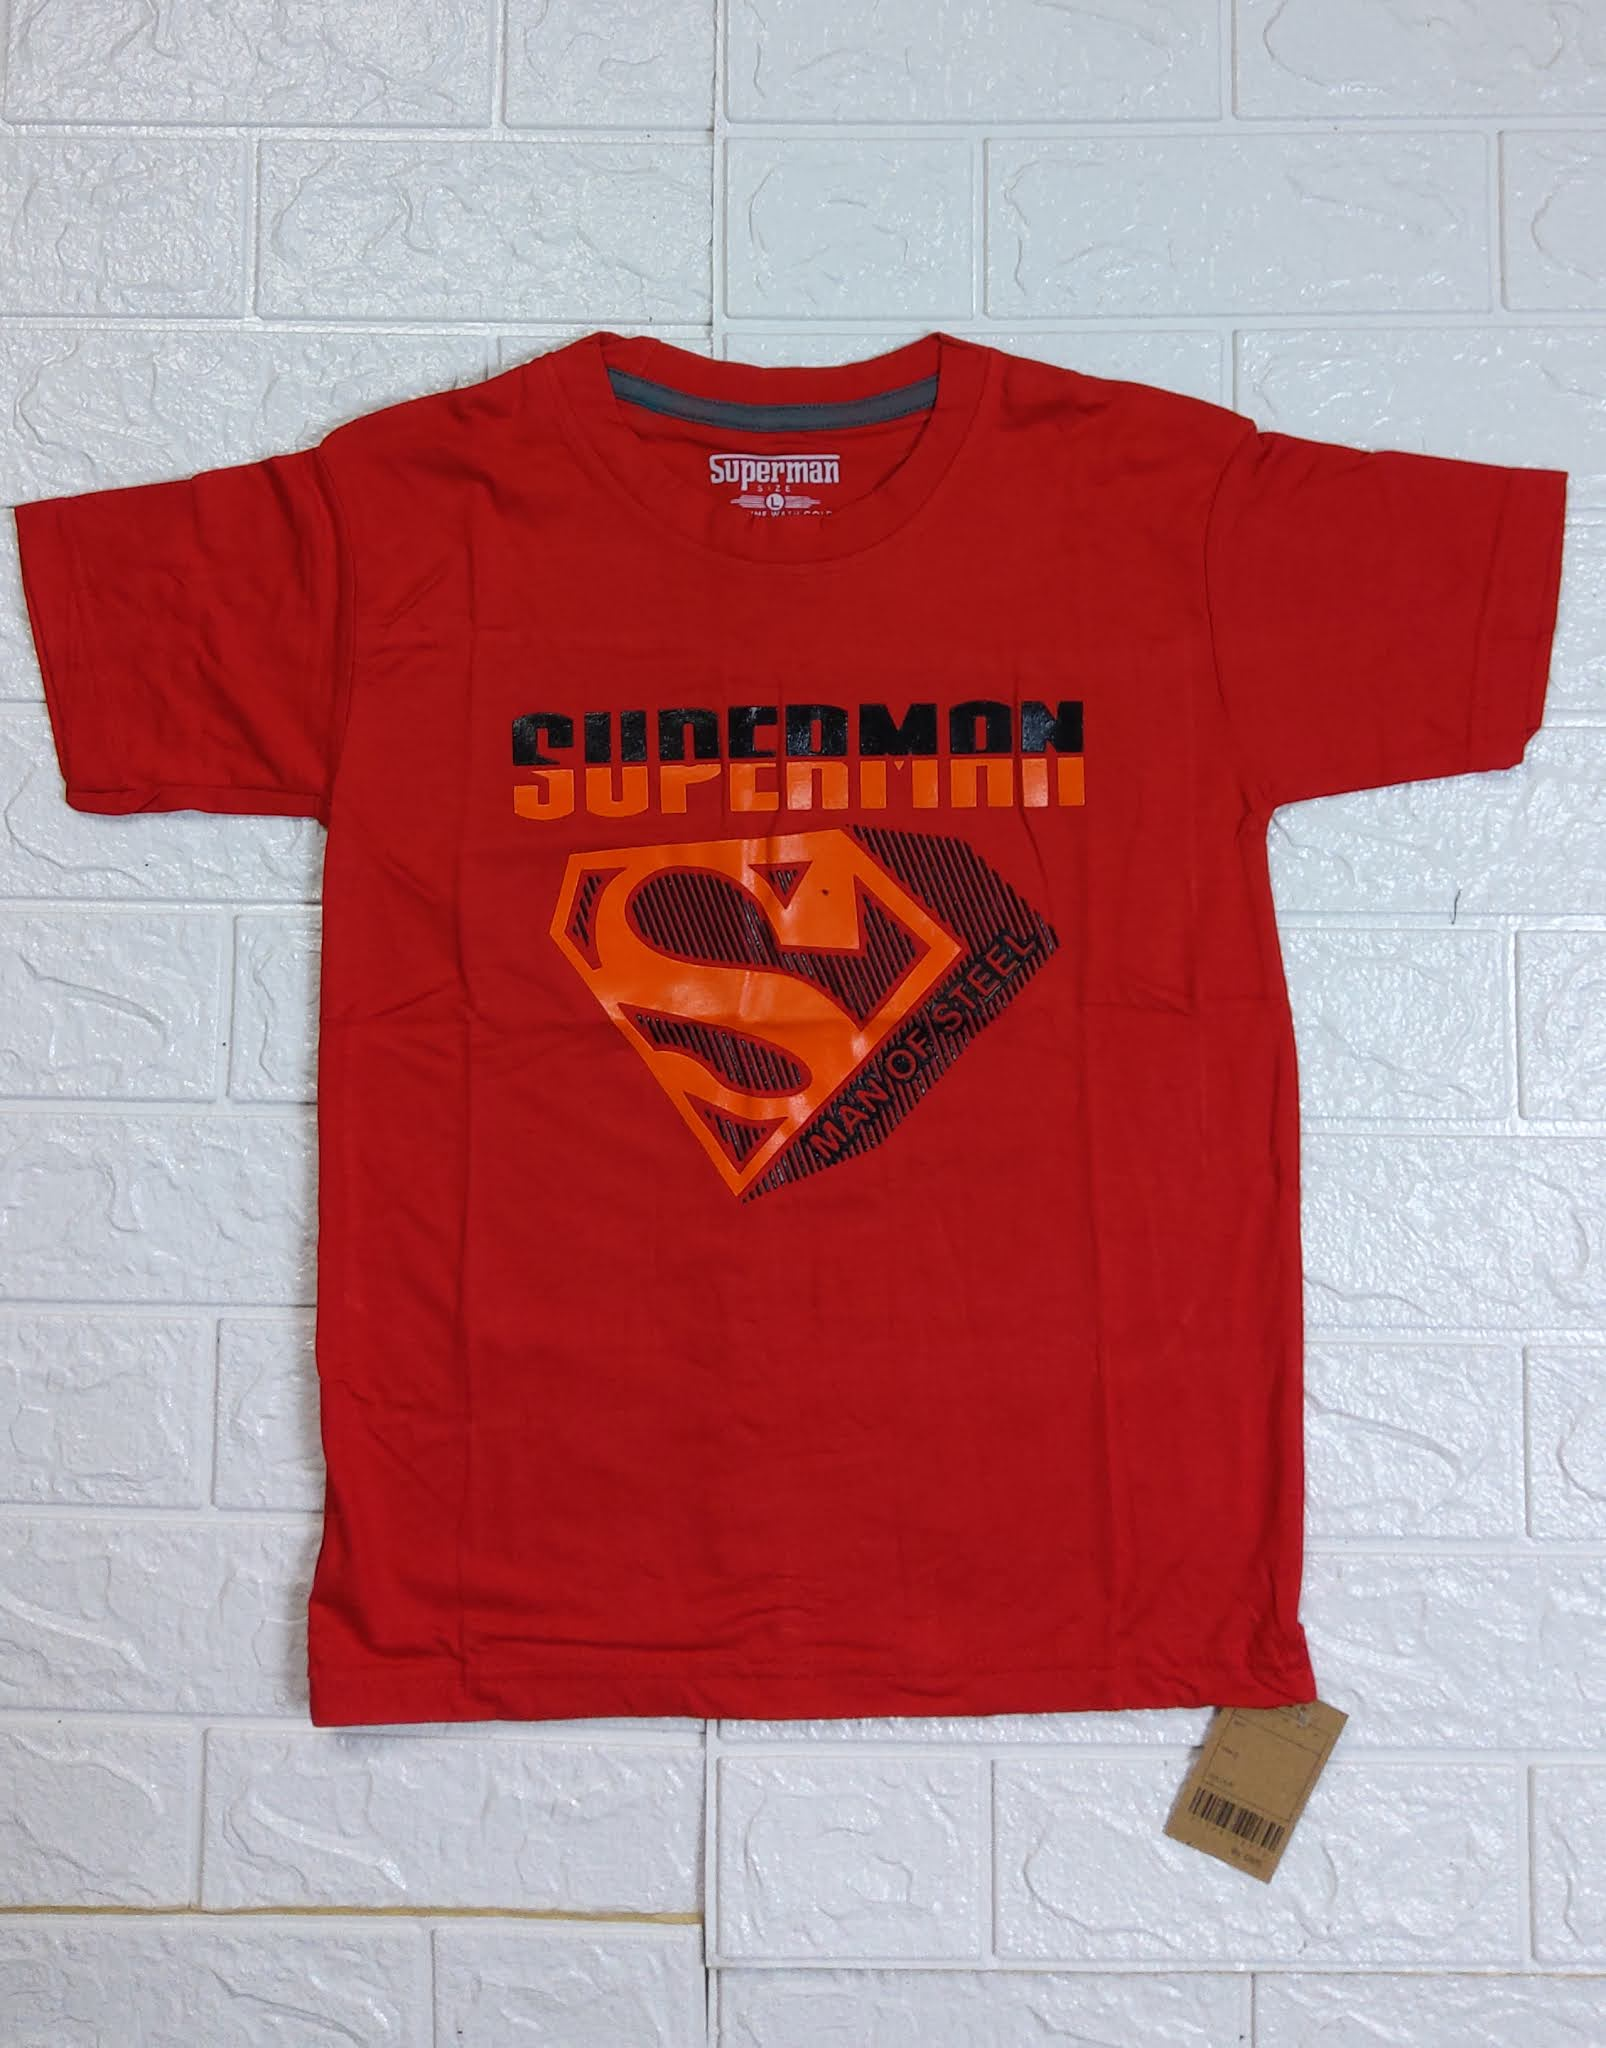 KAOS DAMOSE SPANDEK PDK MOTIF SUPERMAN (ANKL00003)